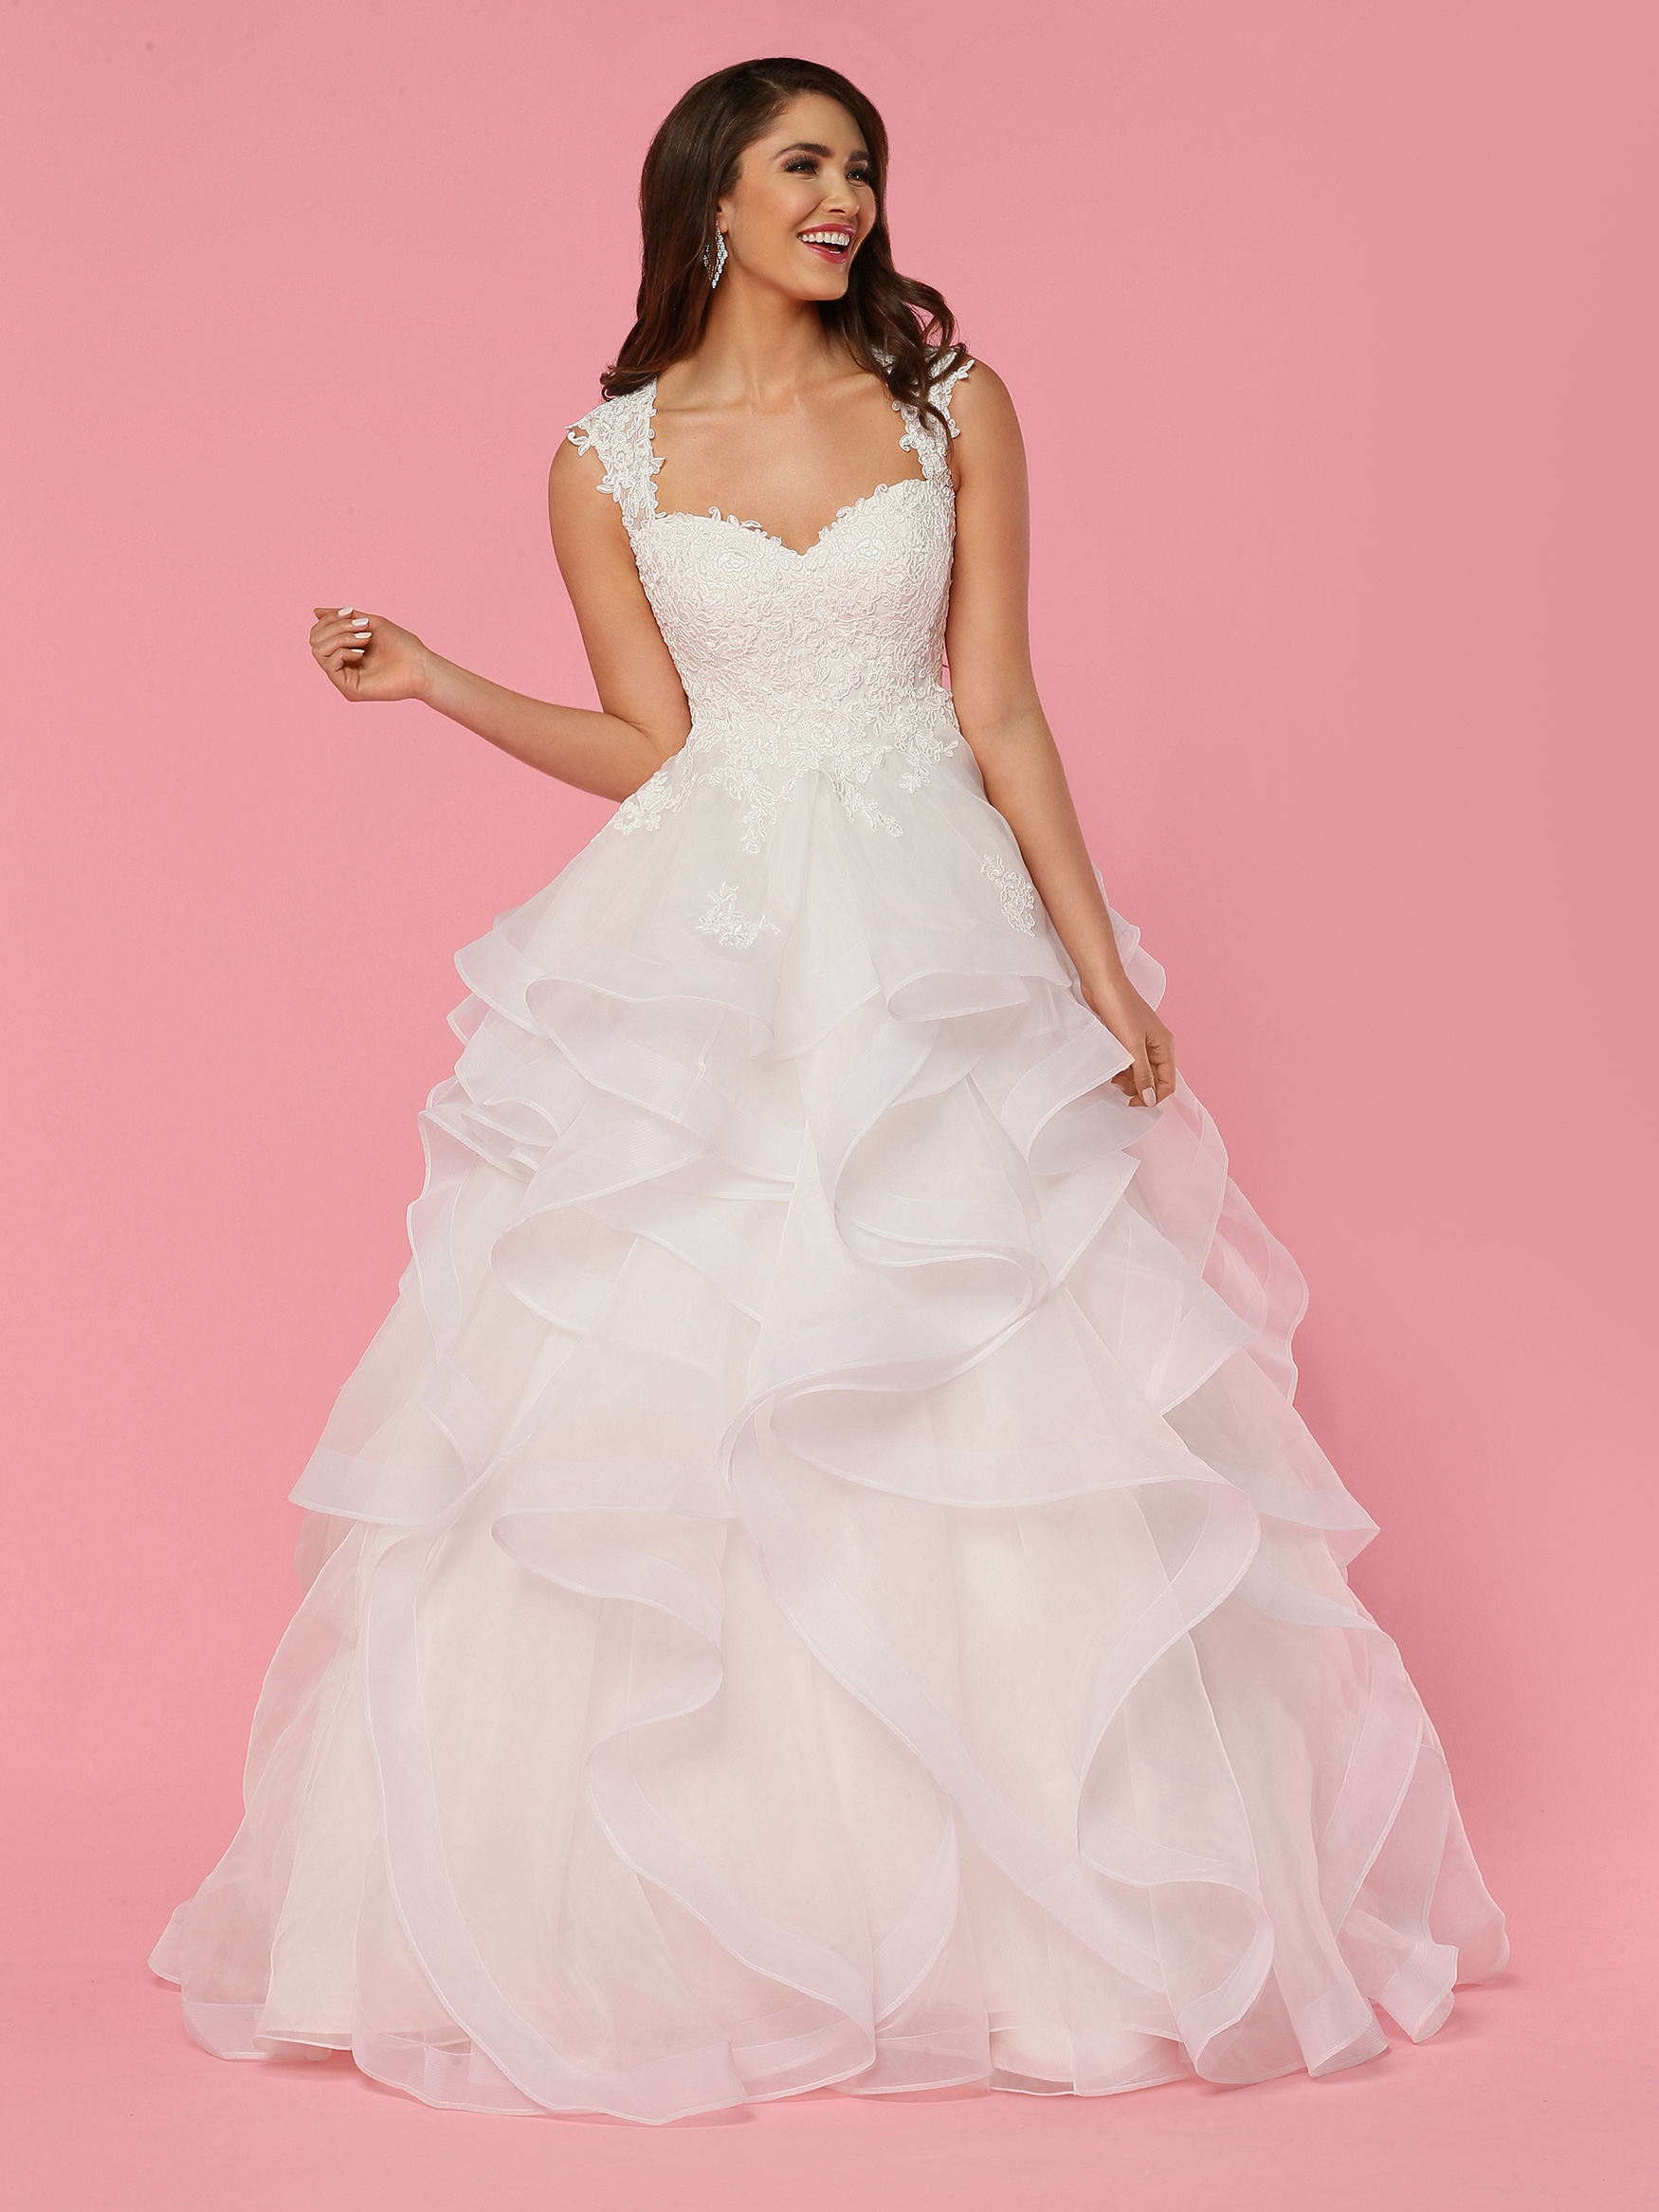 davinci-bridal-gown-09.jpg